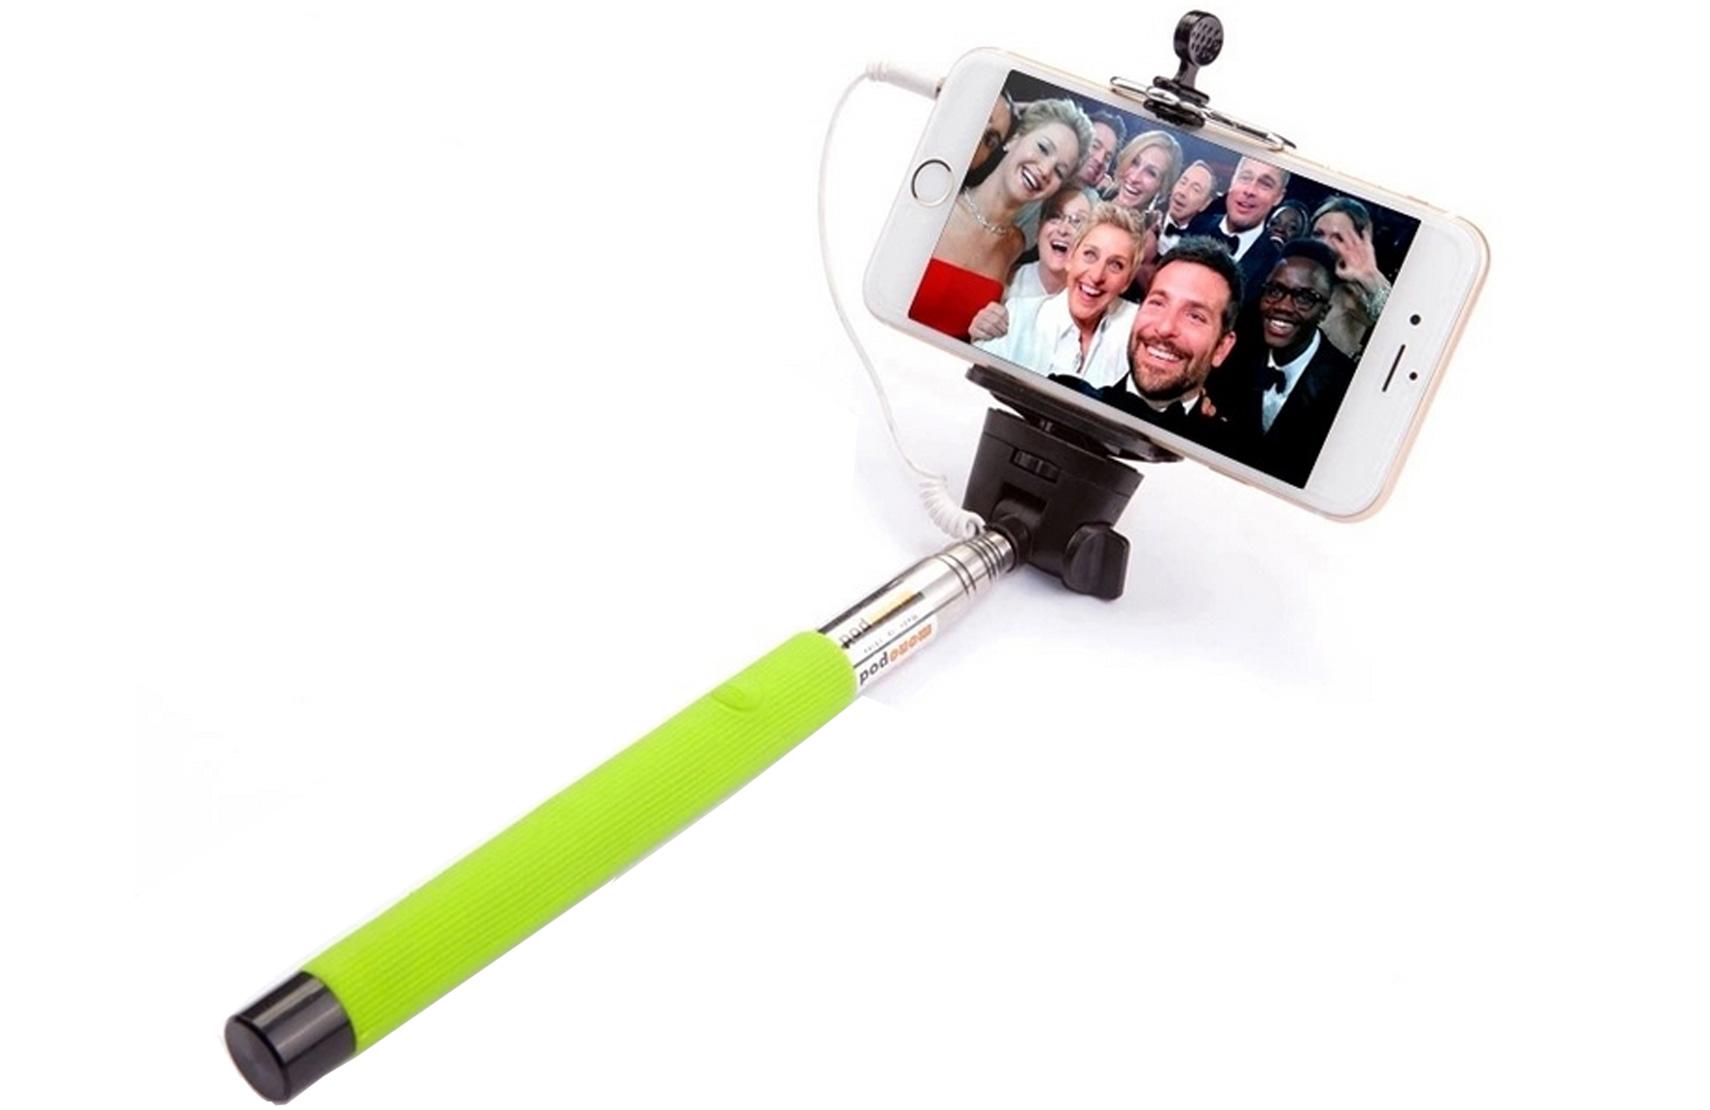 bluetooth selfie stick cable take pole selfie stick. Black Bedroom Furniture Sets. Home Design Ideas